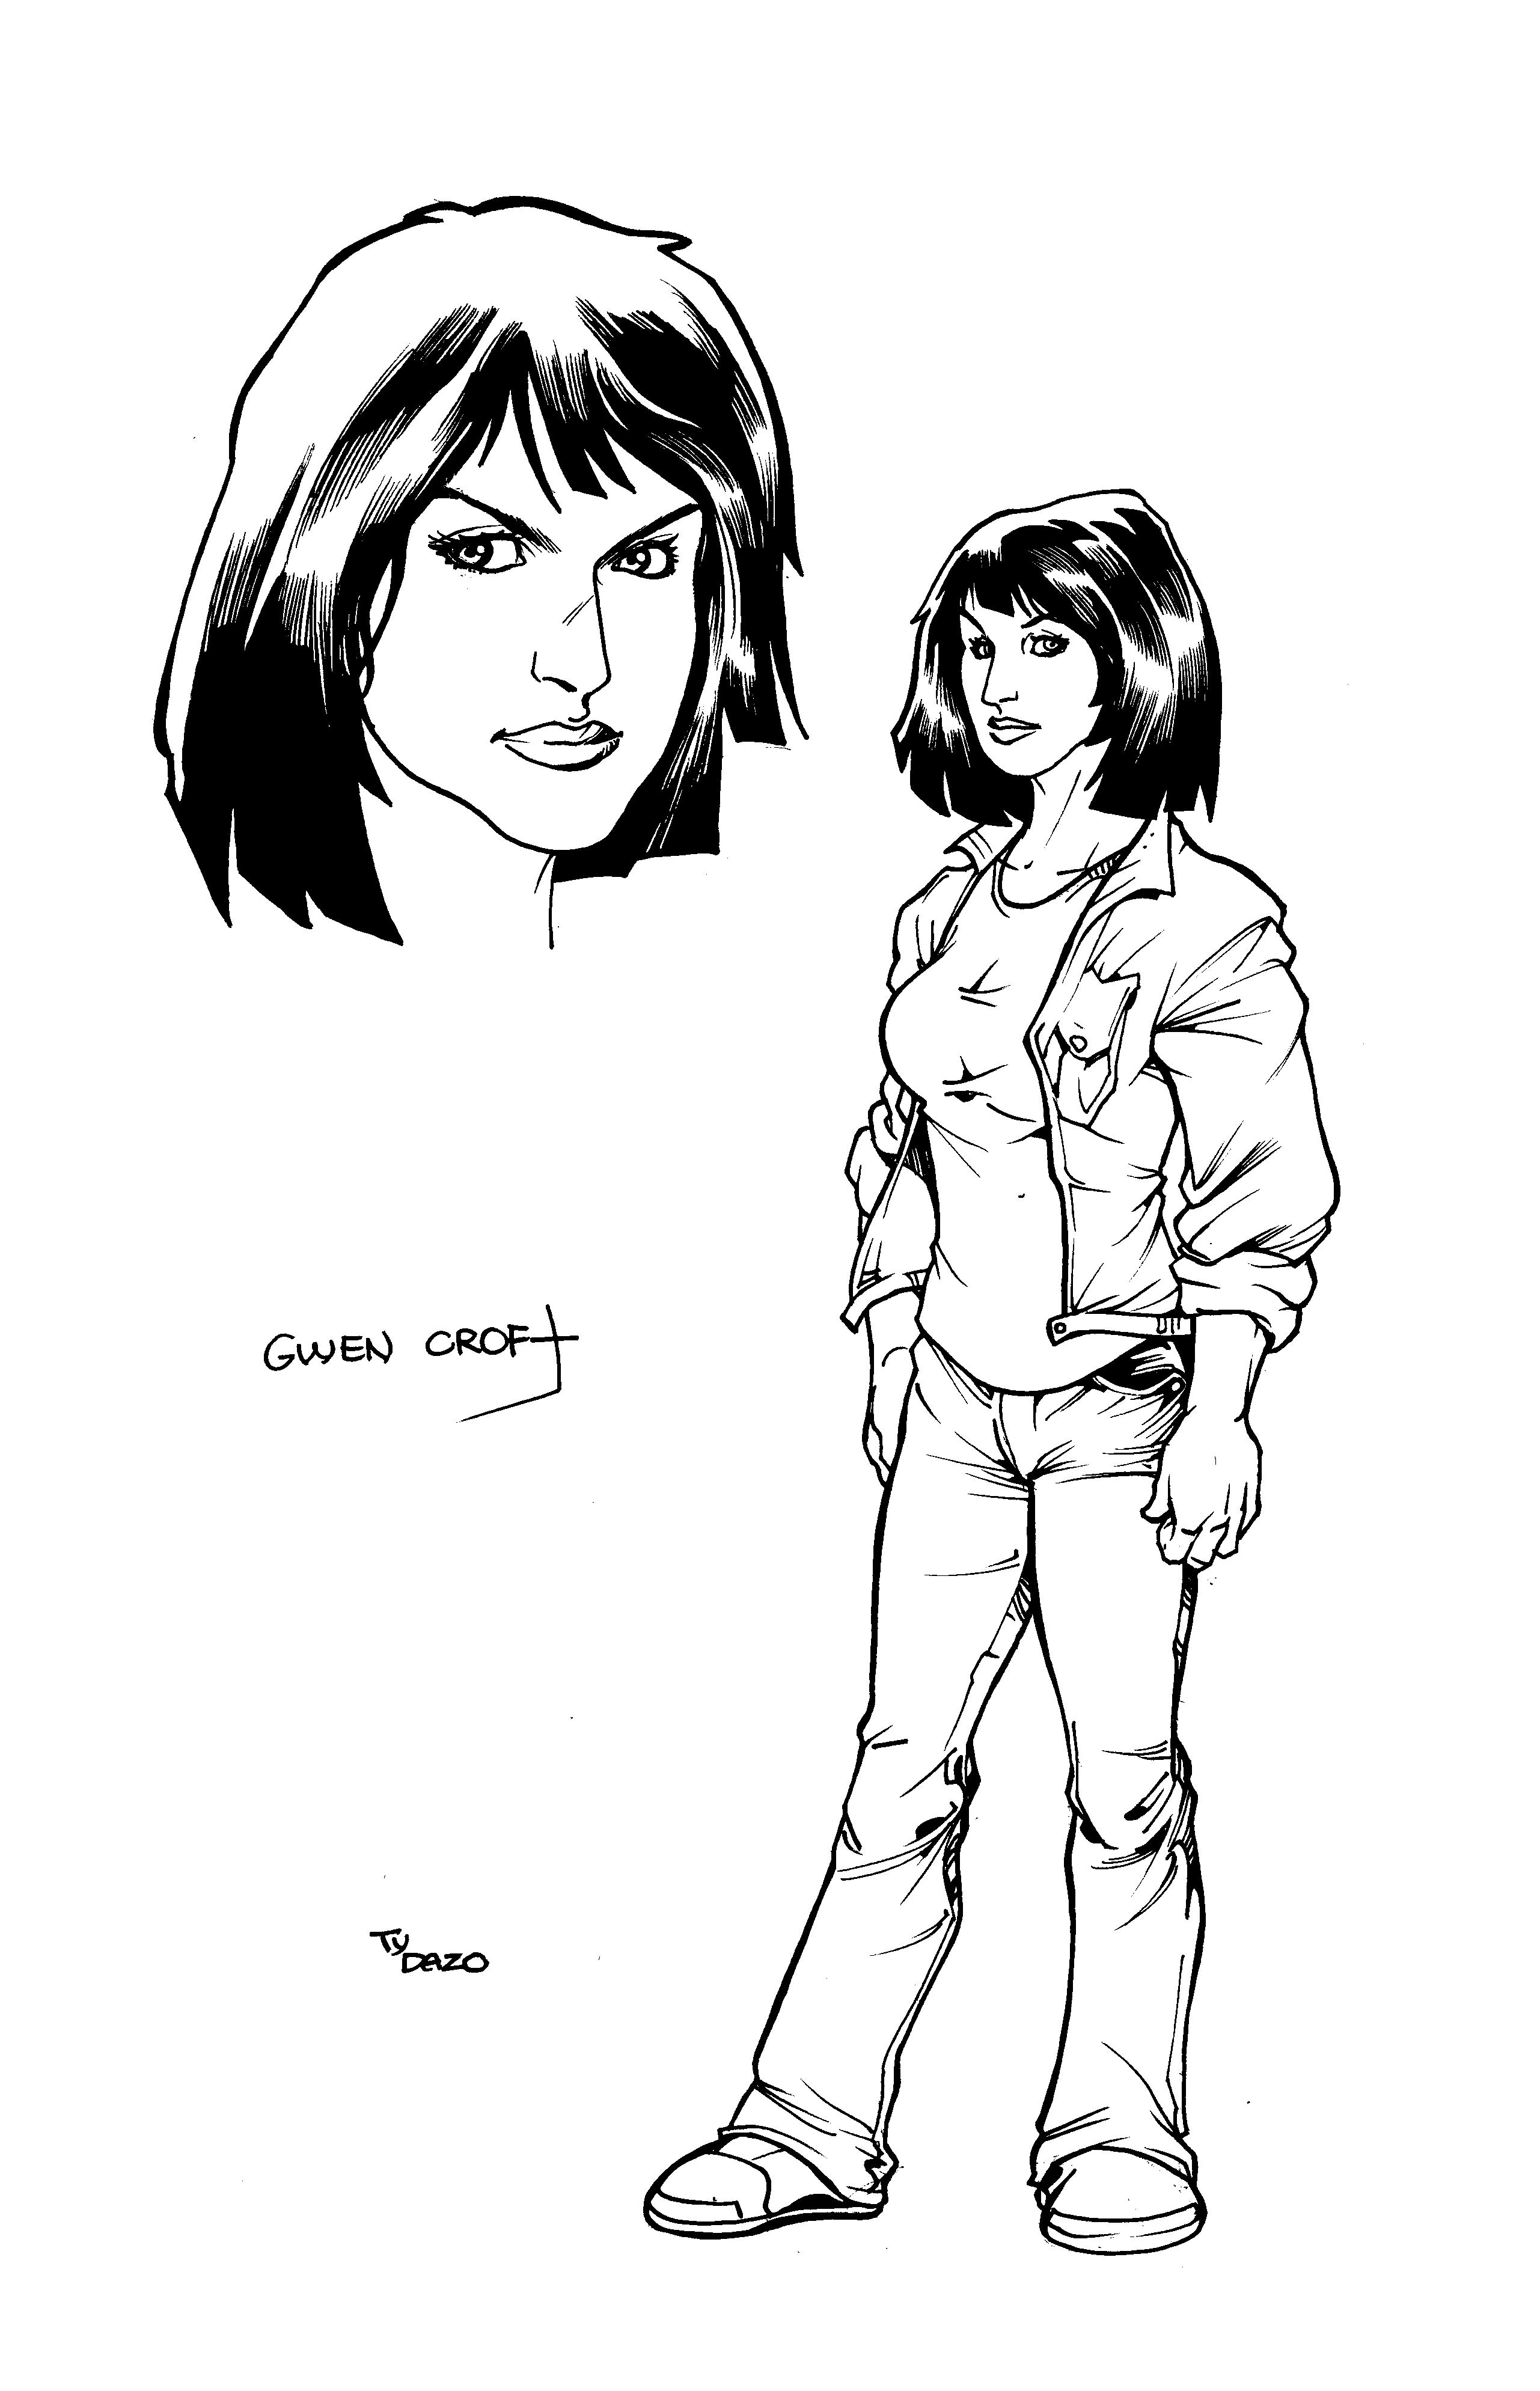 Gwen Croft